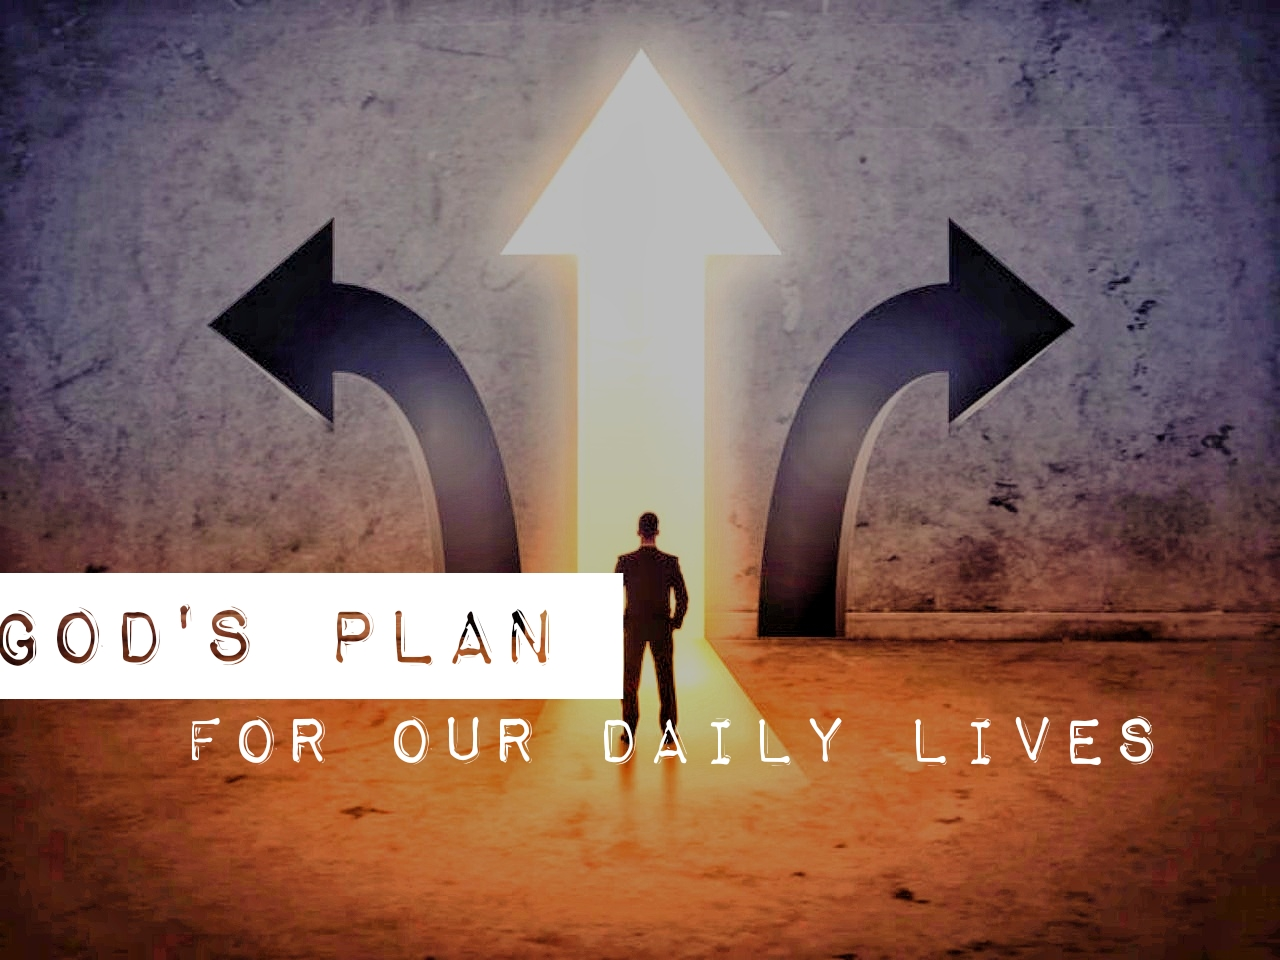 God's plan 03.10.19.jpg